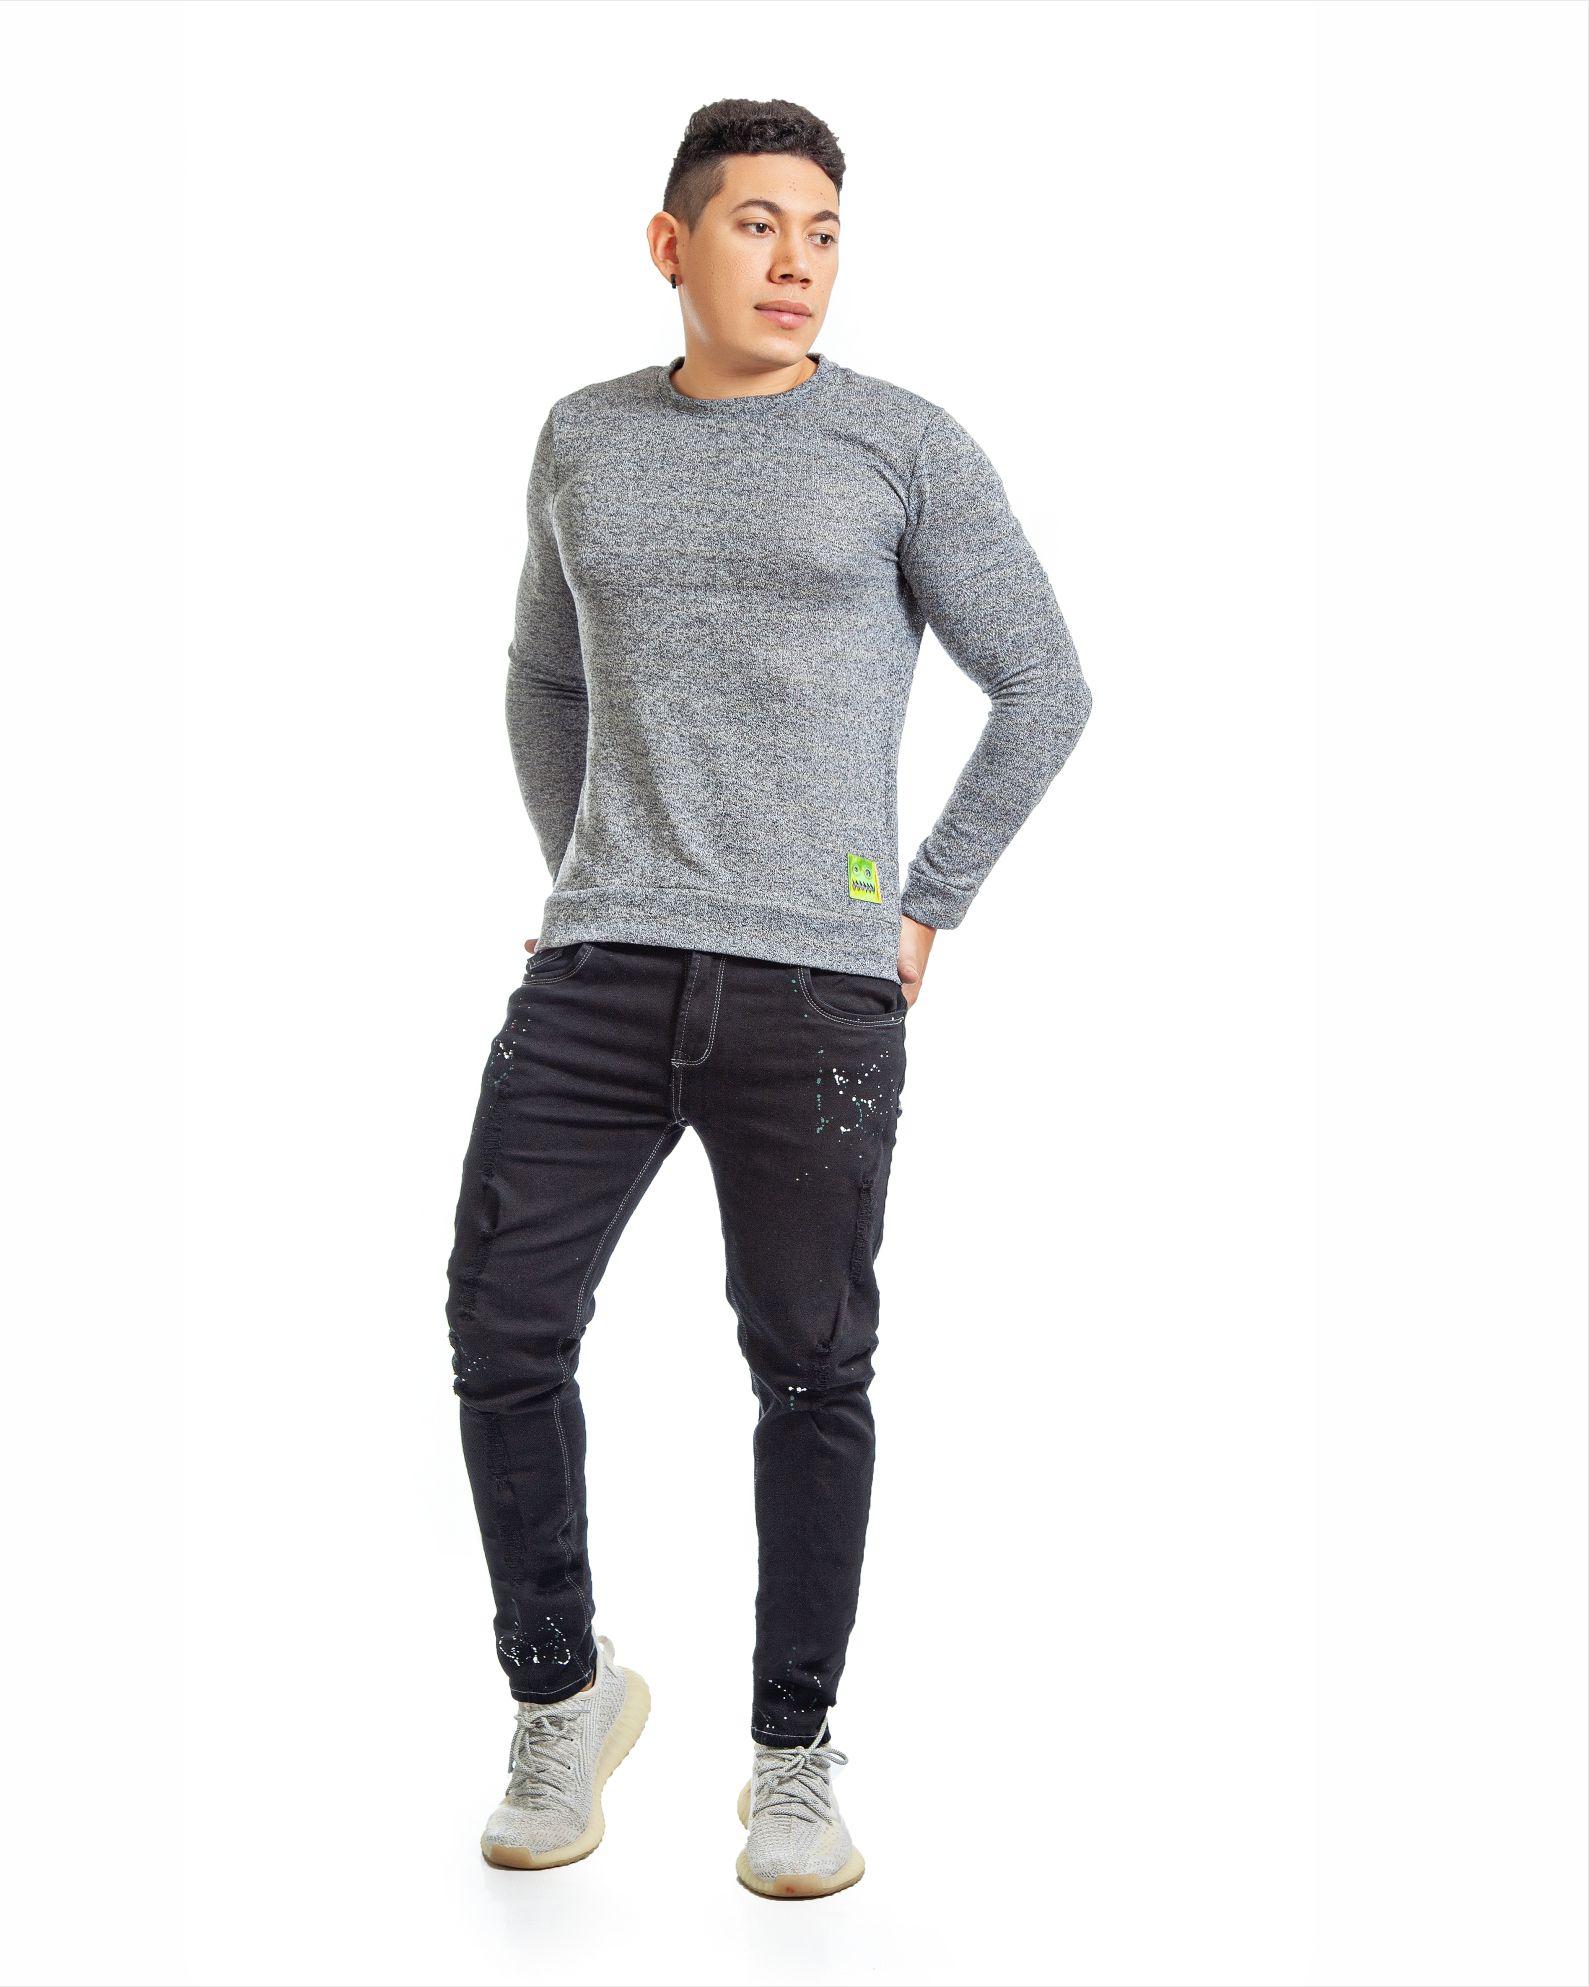 ref 1755 1 buzo gris tejido, tela en algodón 80% + 18% poliéster + 2% Spandex. Tallas S-M-L-XL. $72.000.